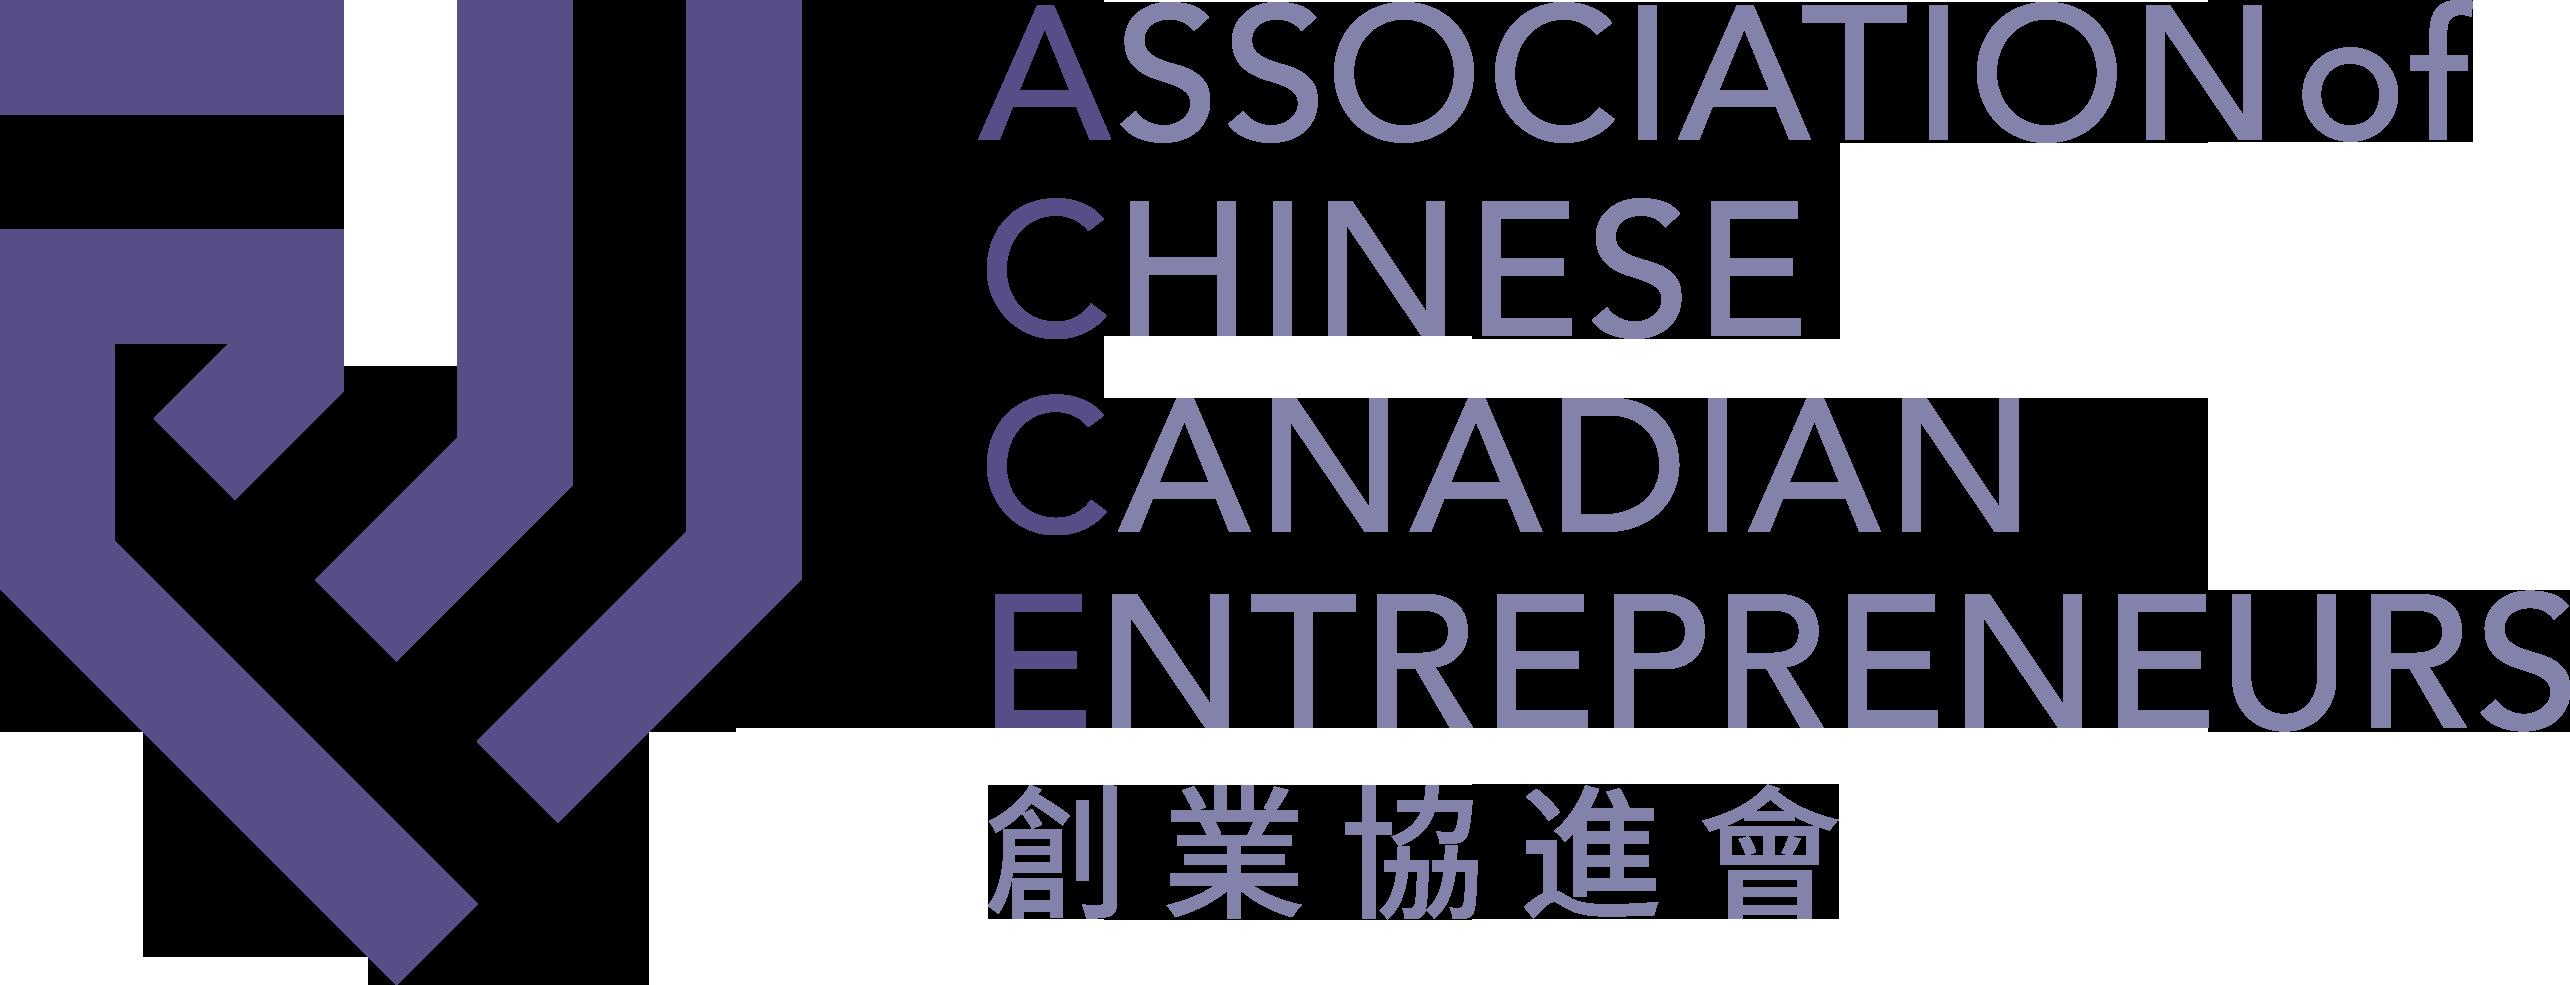 Association of Chinese Canadian Entrepreneurs